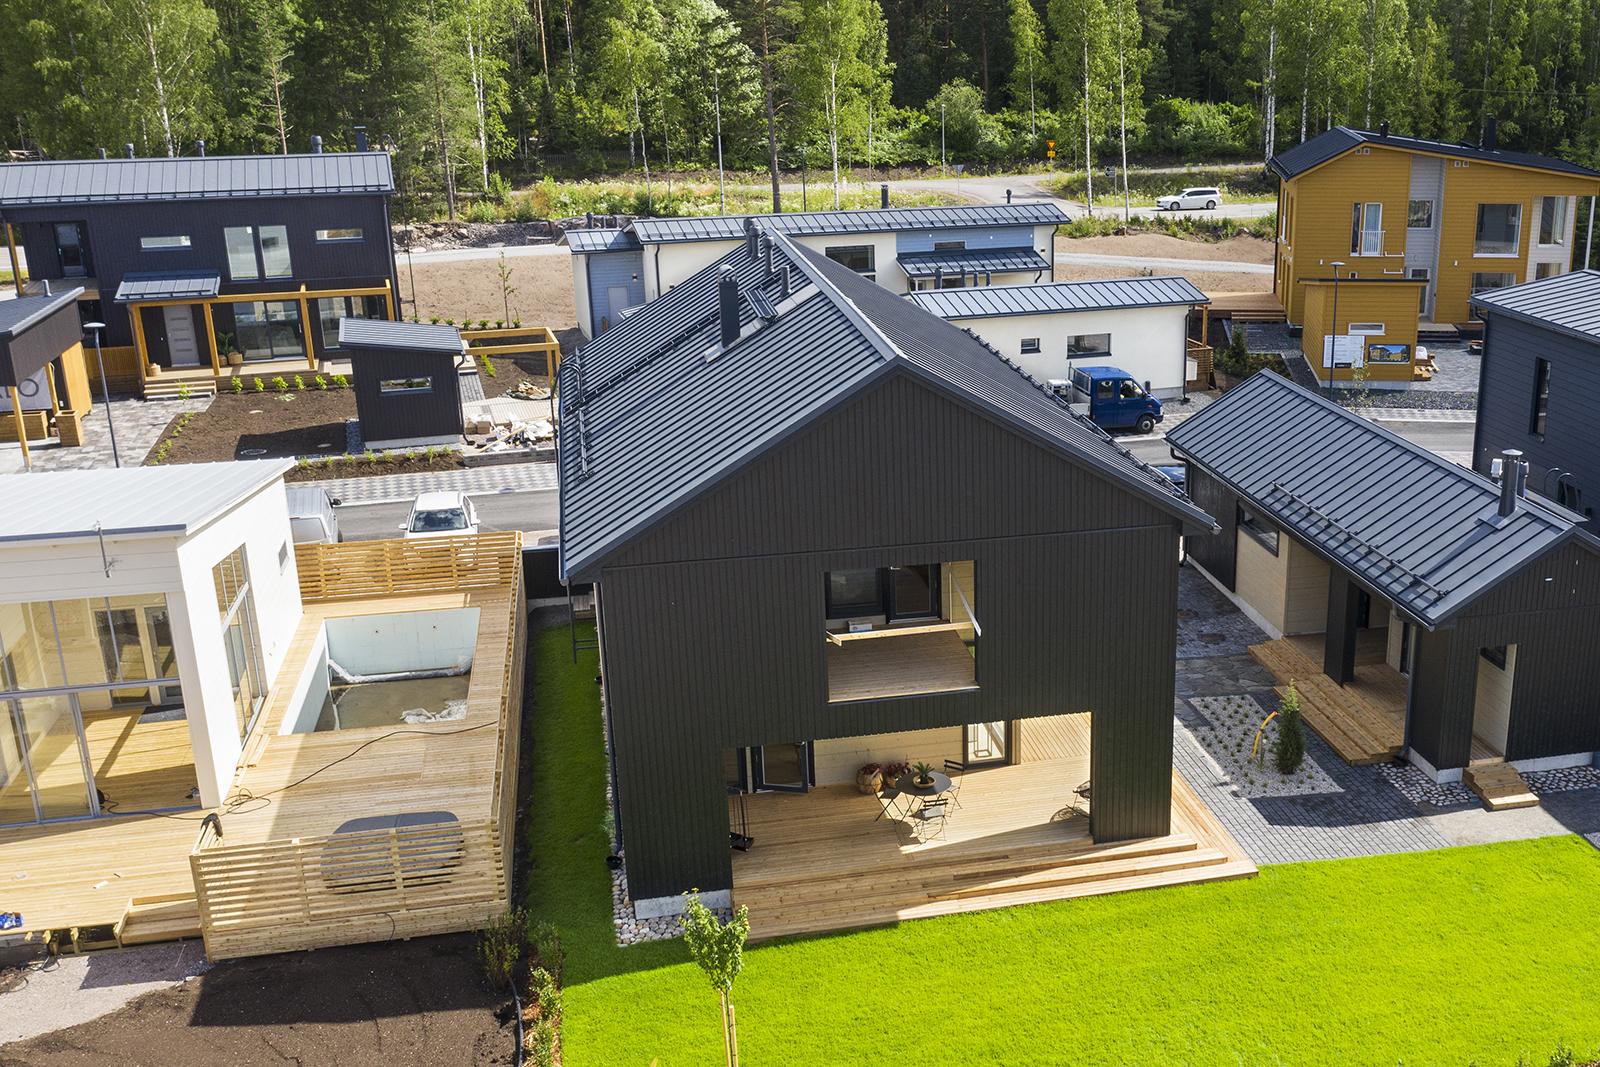 Housing Fare in Finland, Tuusula, 2020. Photo: Kari Kohvakka